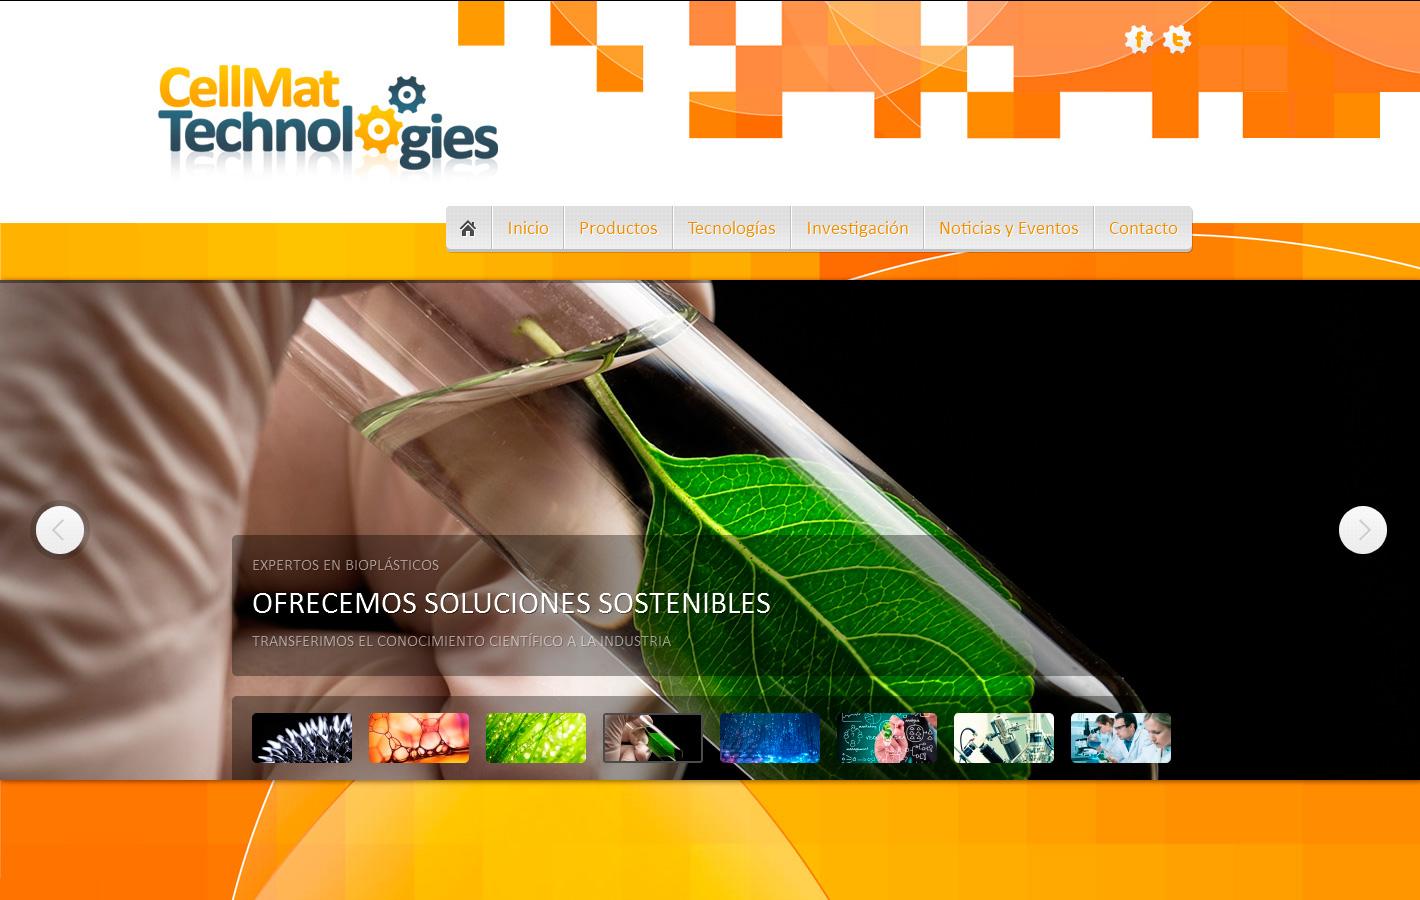 CellMat Technologies materiales celulares